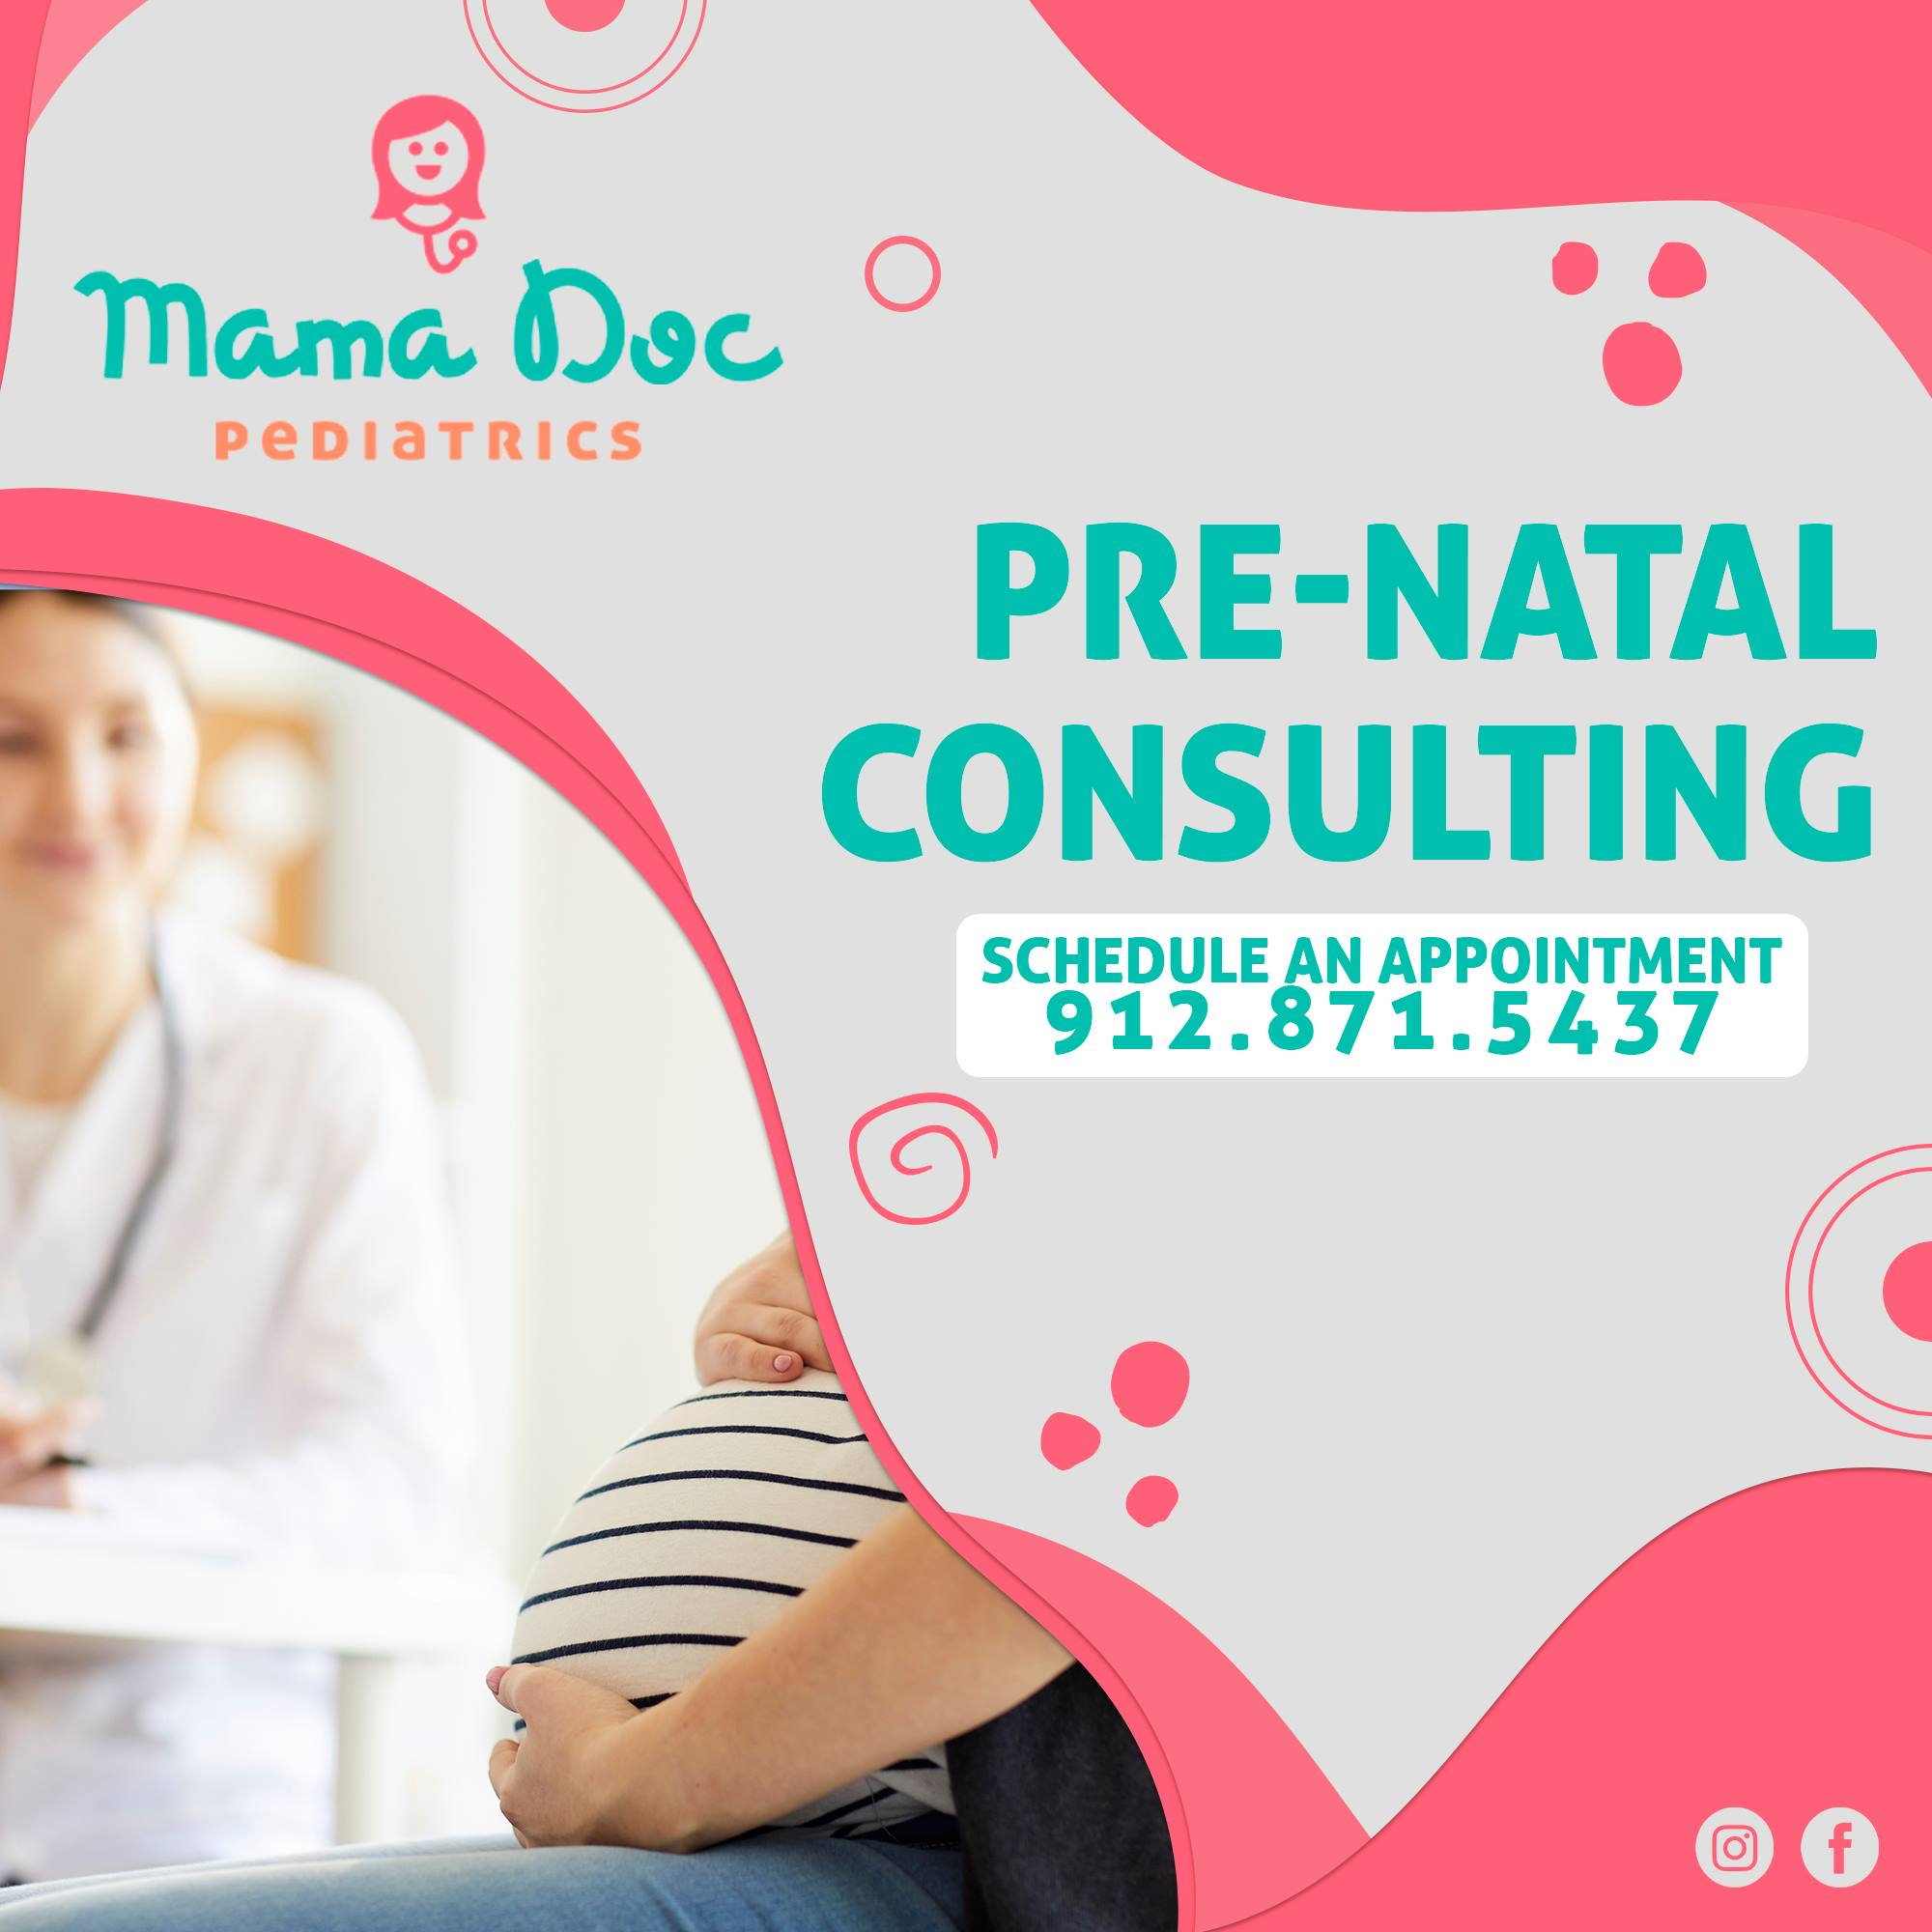 Mamadoc Pediatrics